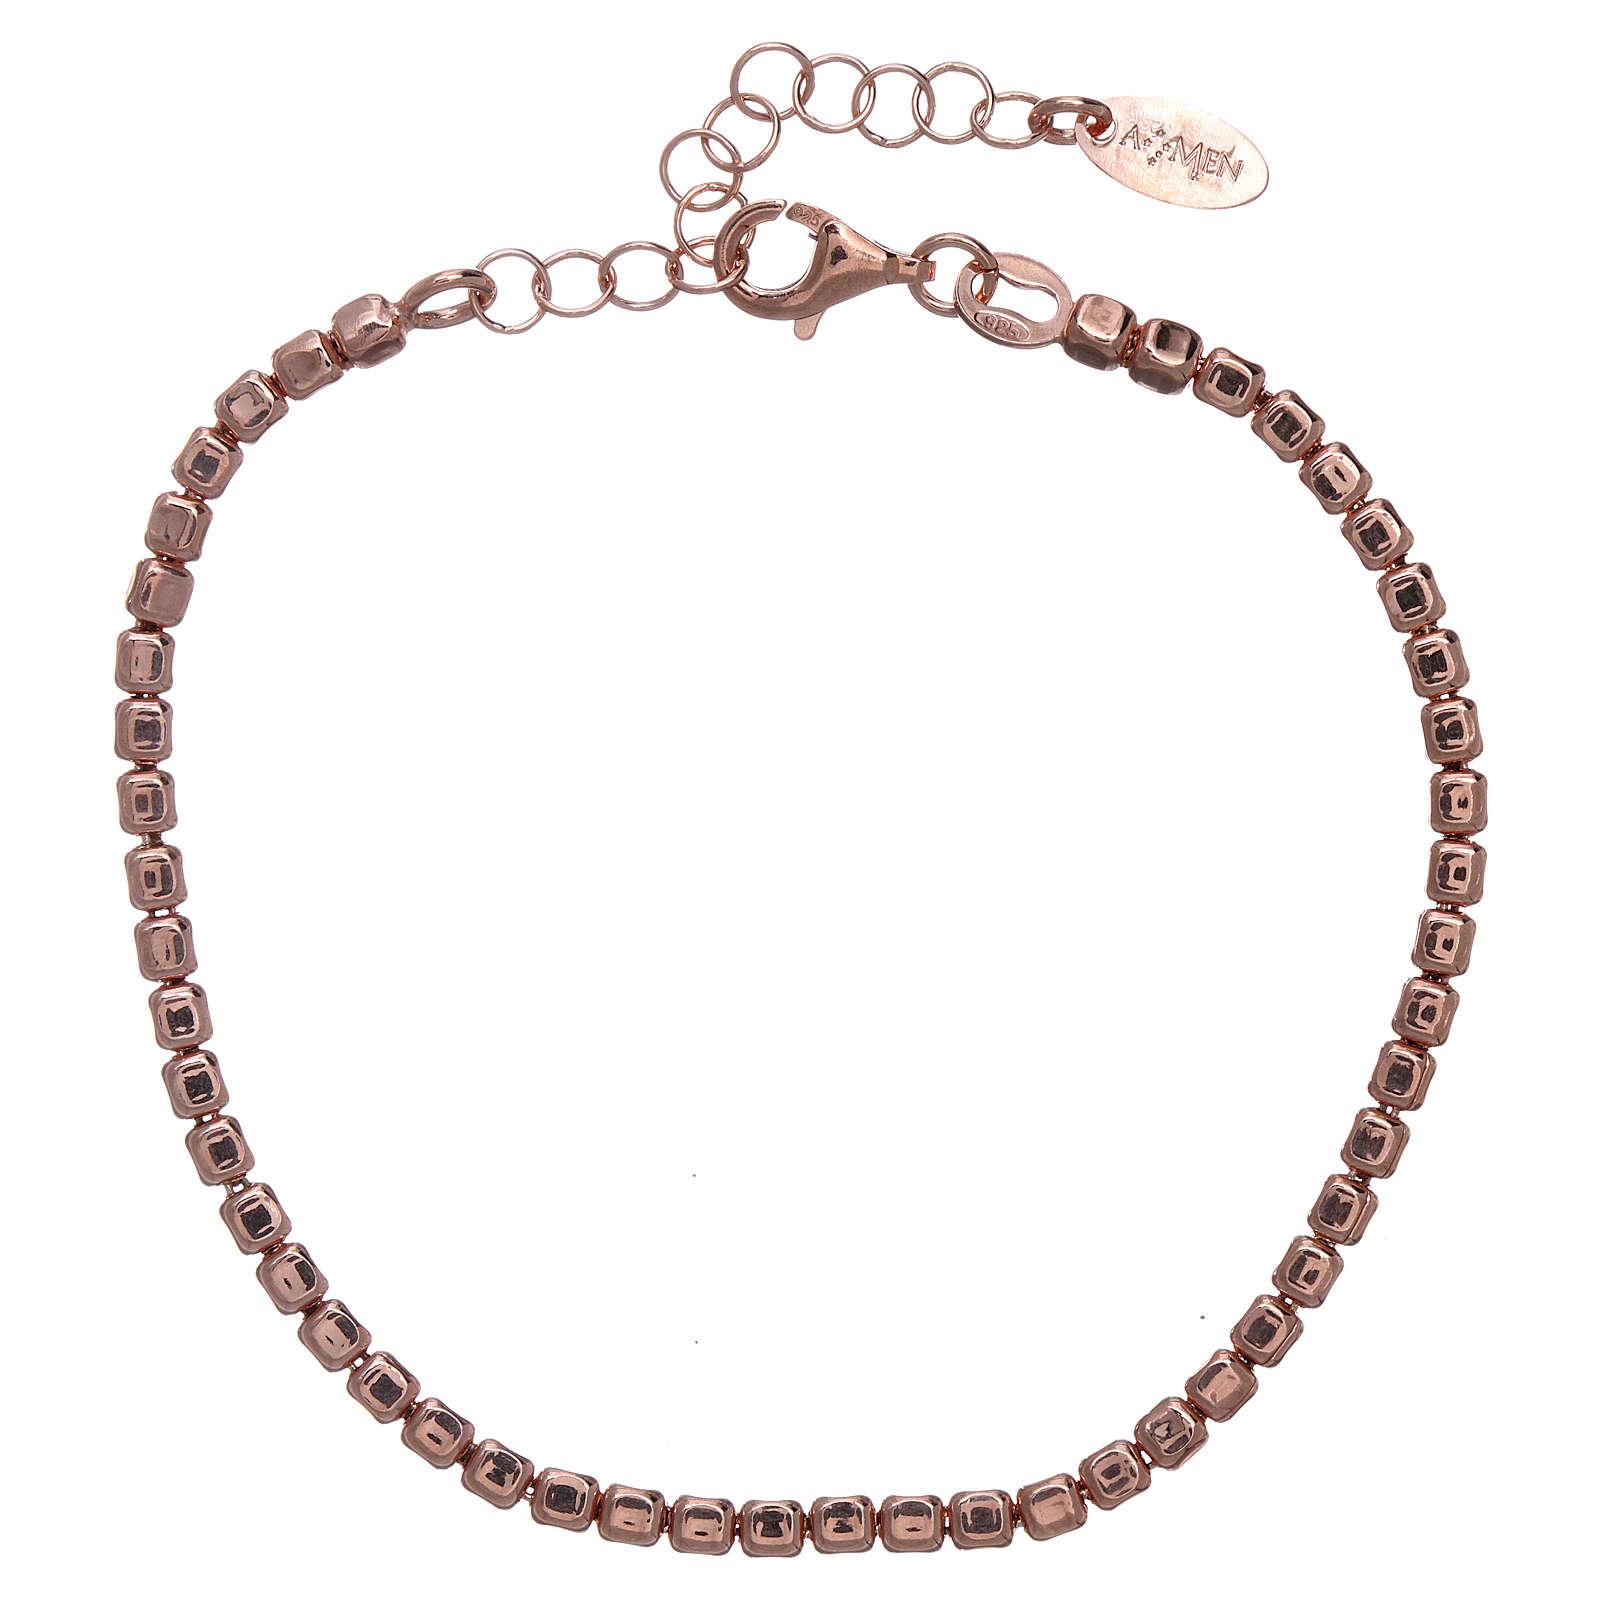 Bracciale Arg 925 con pepite rosé AMEN 4